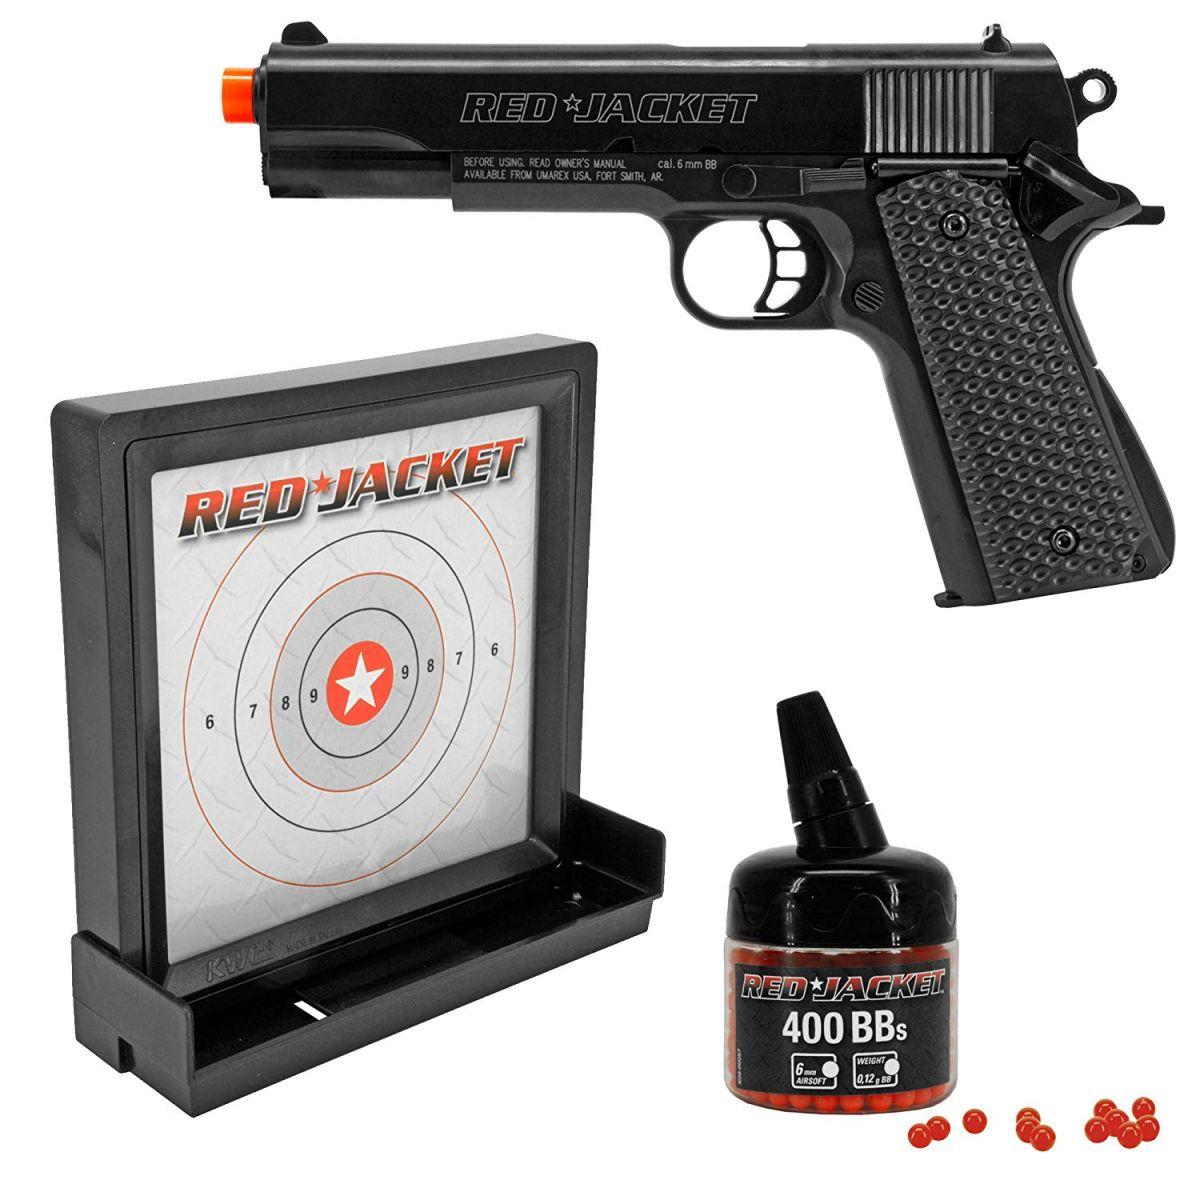 Umarex Red Jacket M1911 6mm Airsoft Spring Pistol Target